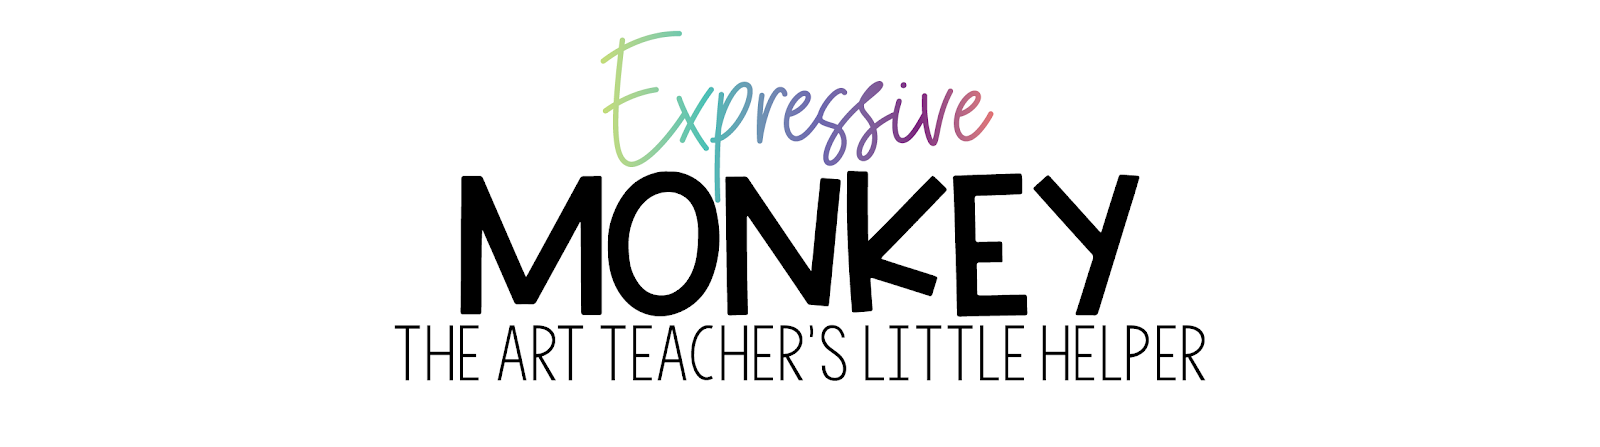 Expressive Monkey